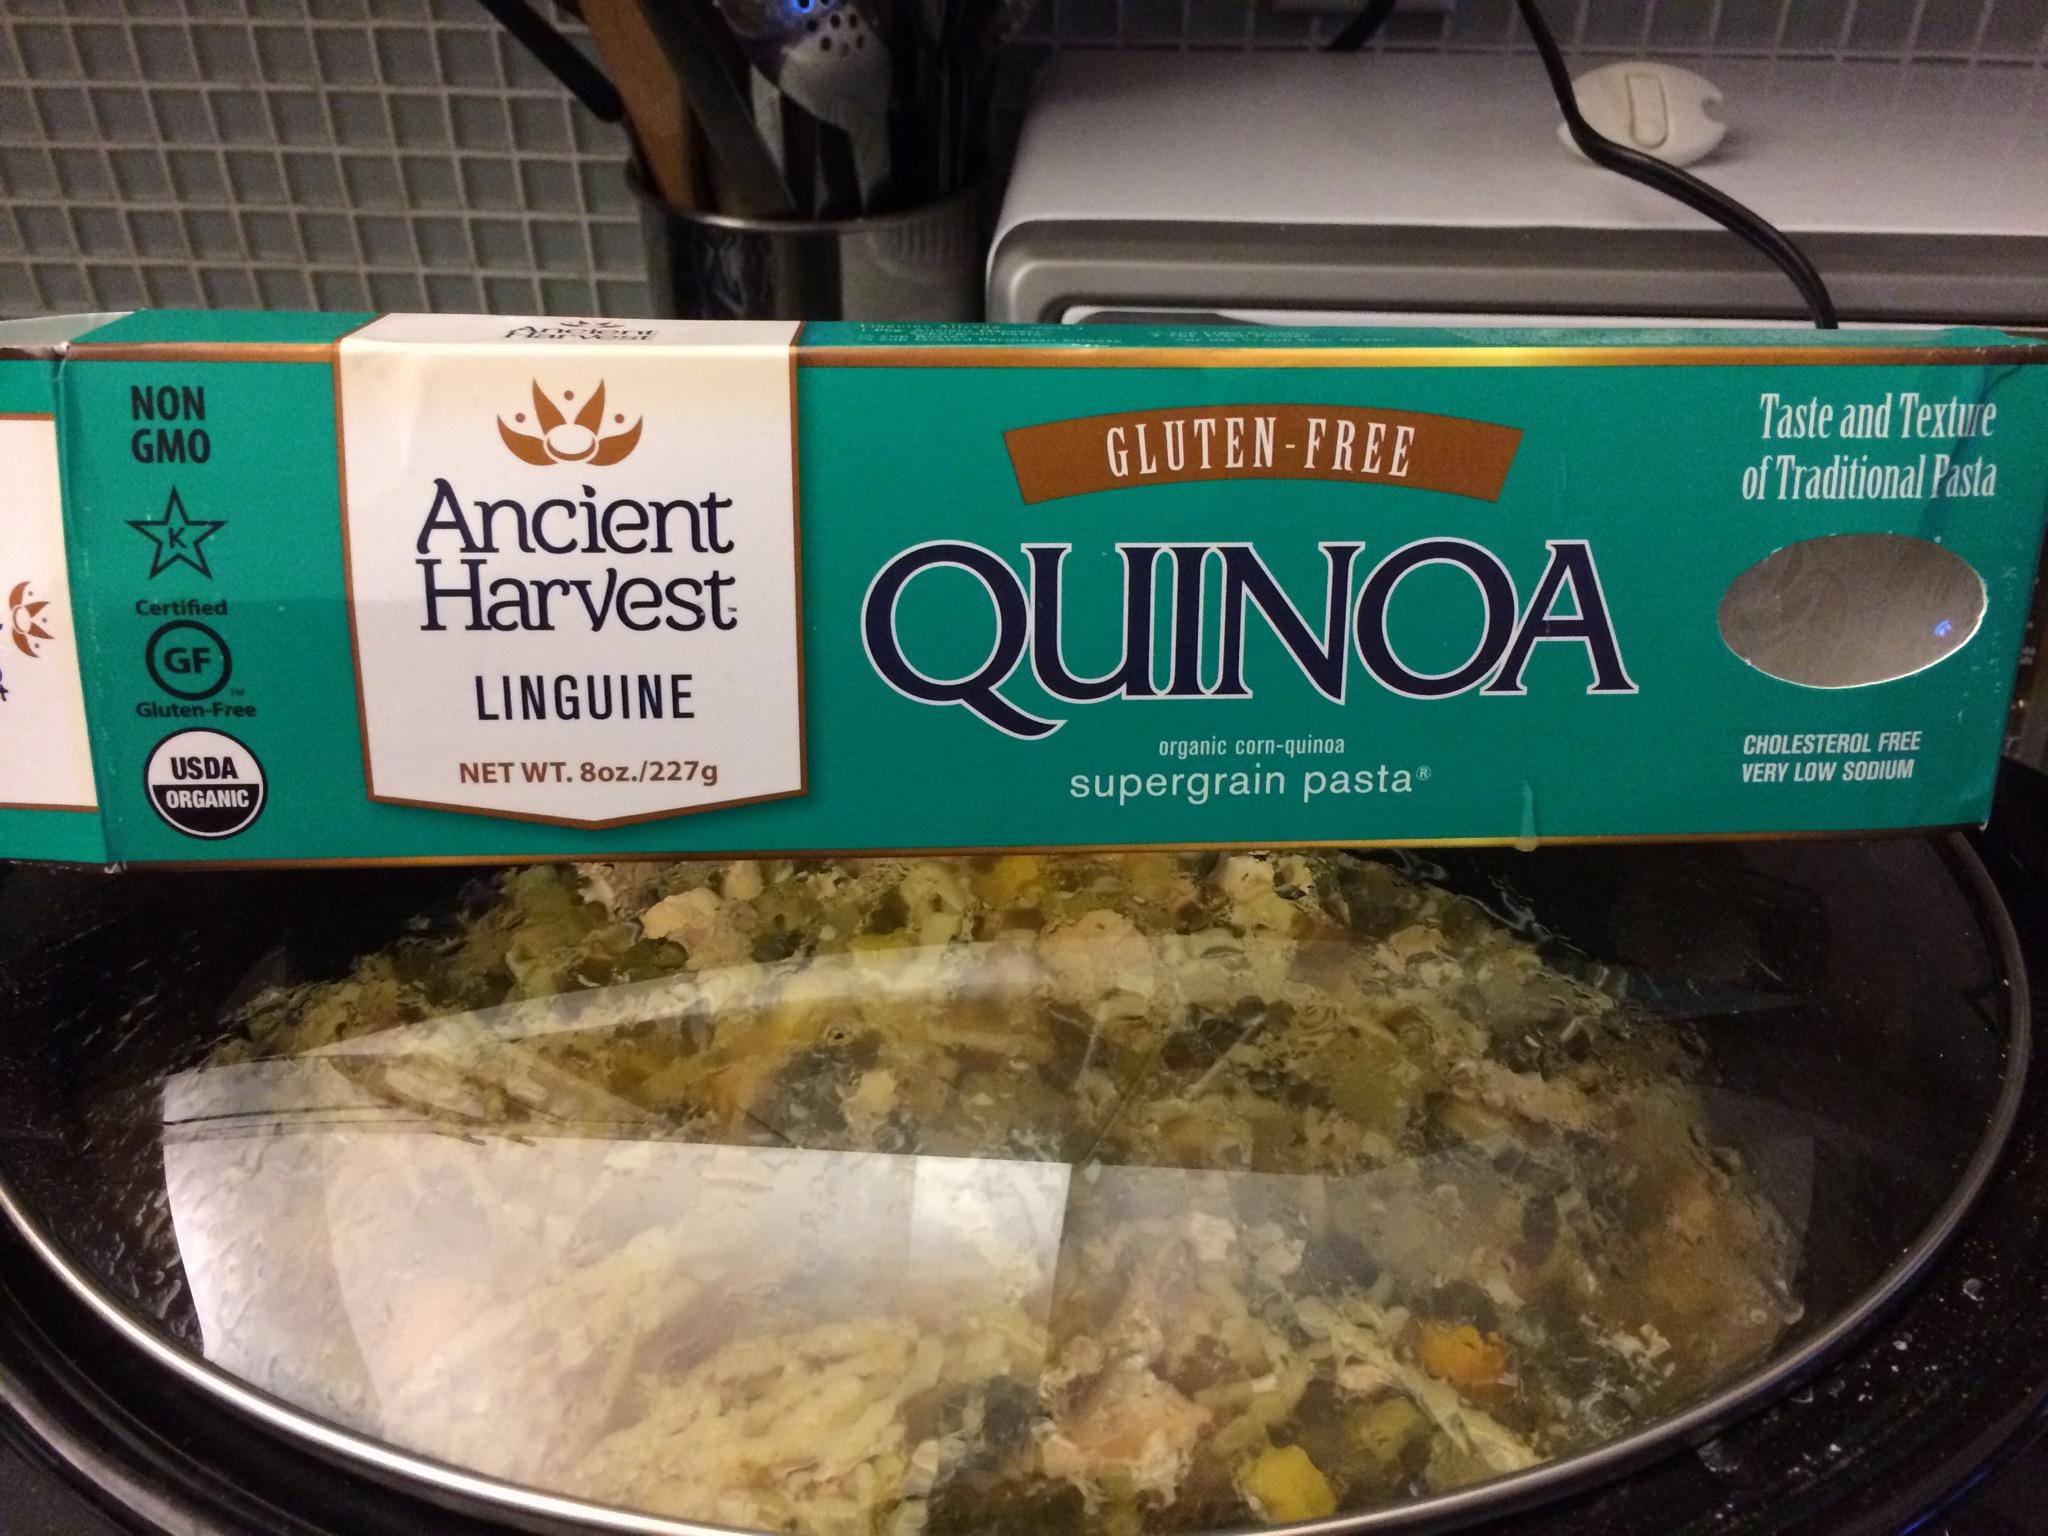 Quinoa linguini is a great alternative to traditional pasta